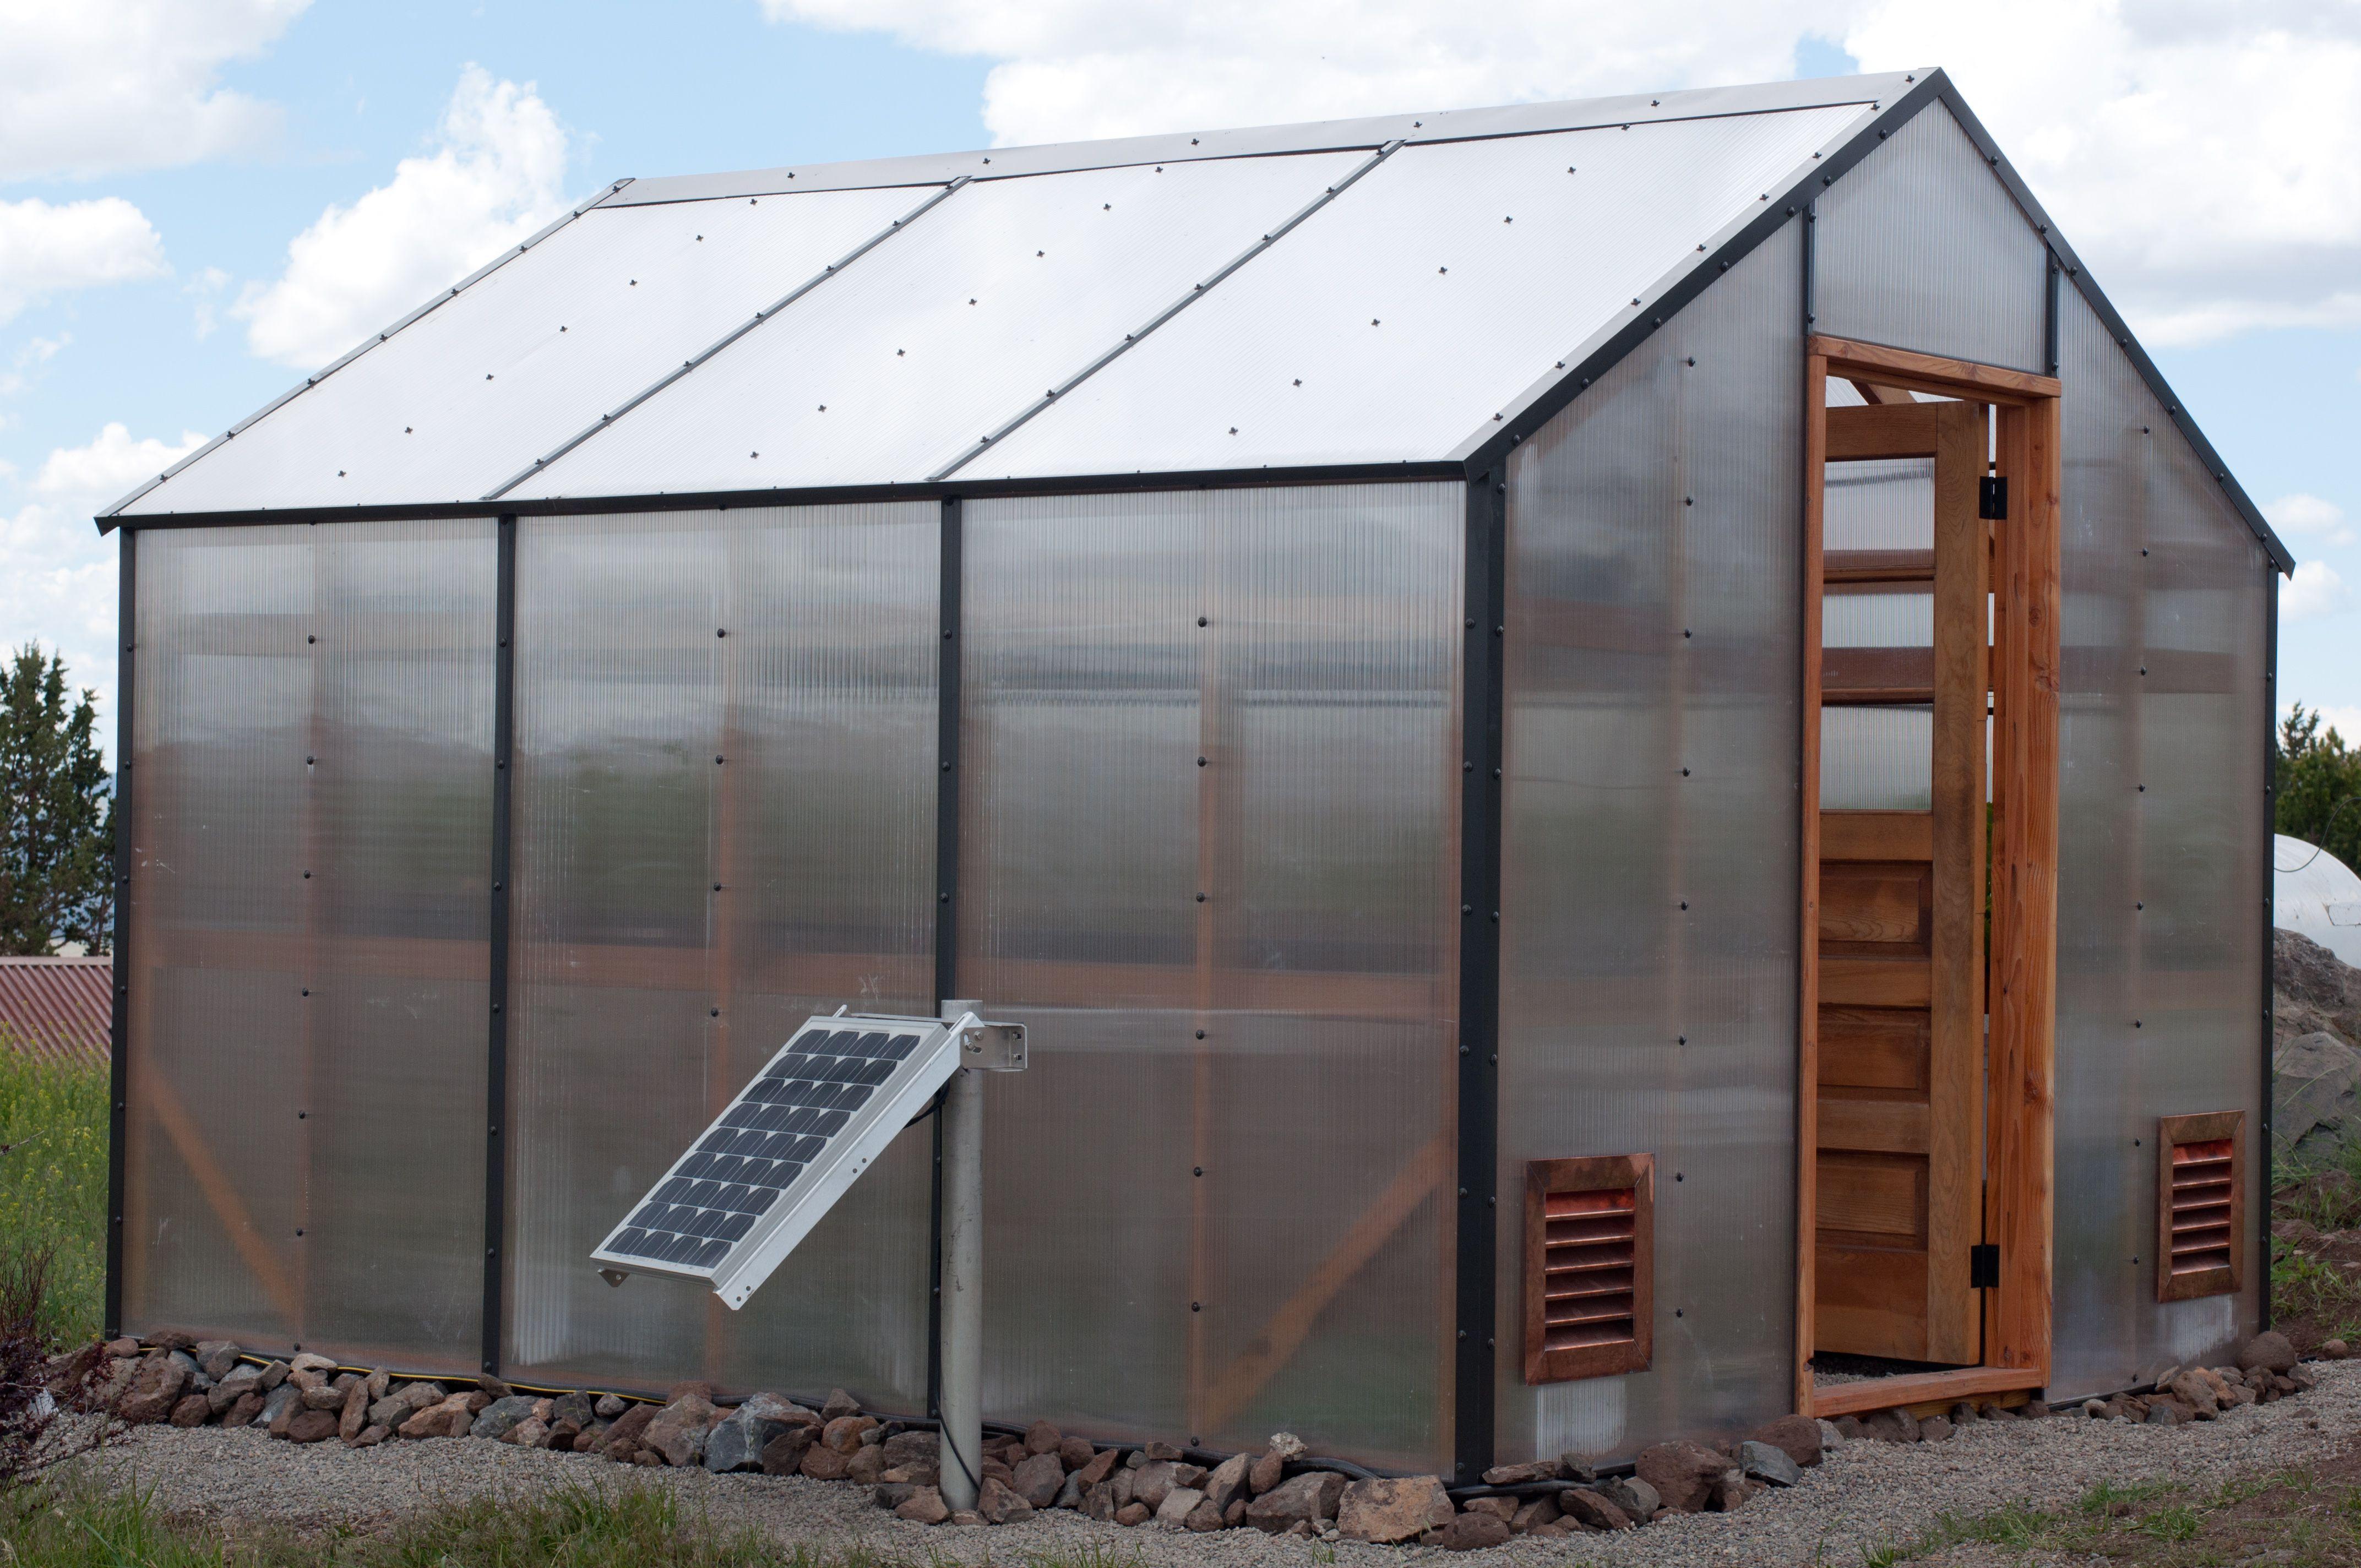 Solar Powered Greenhouse Ventilation Fan | Sevenstonesinc.com on